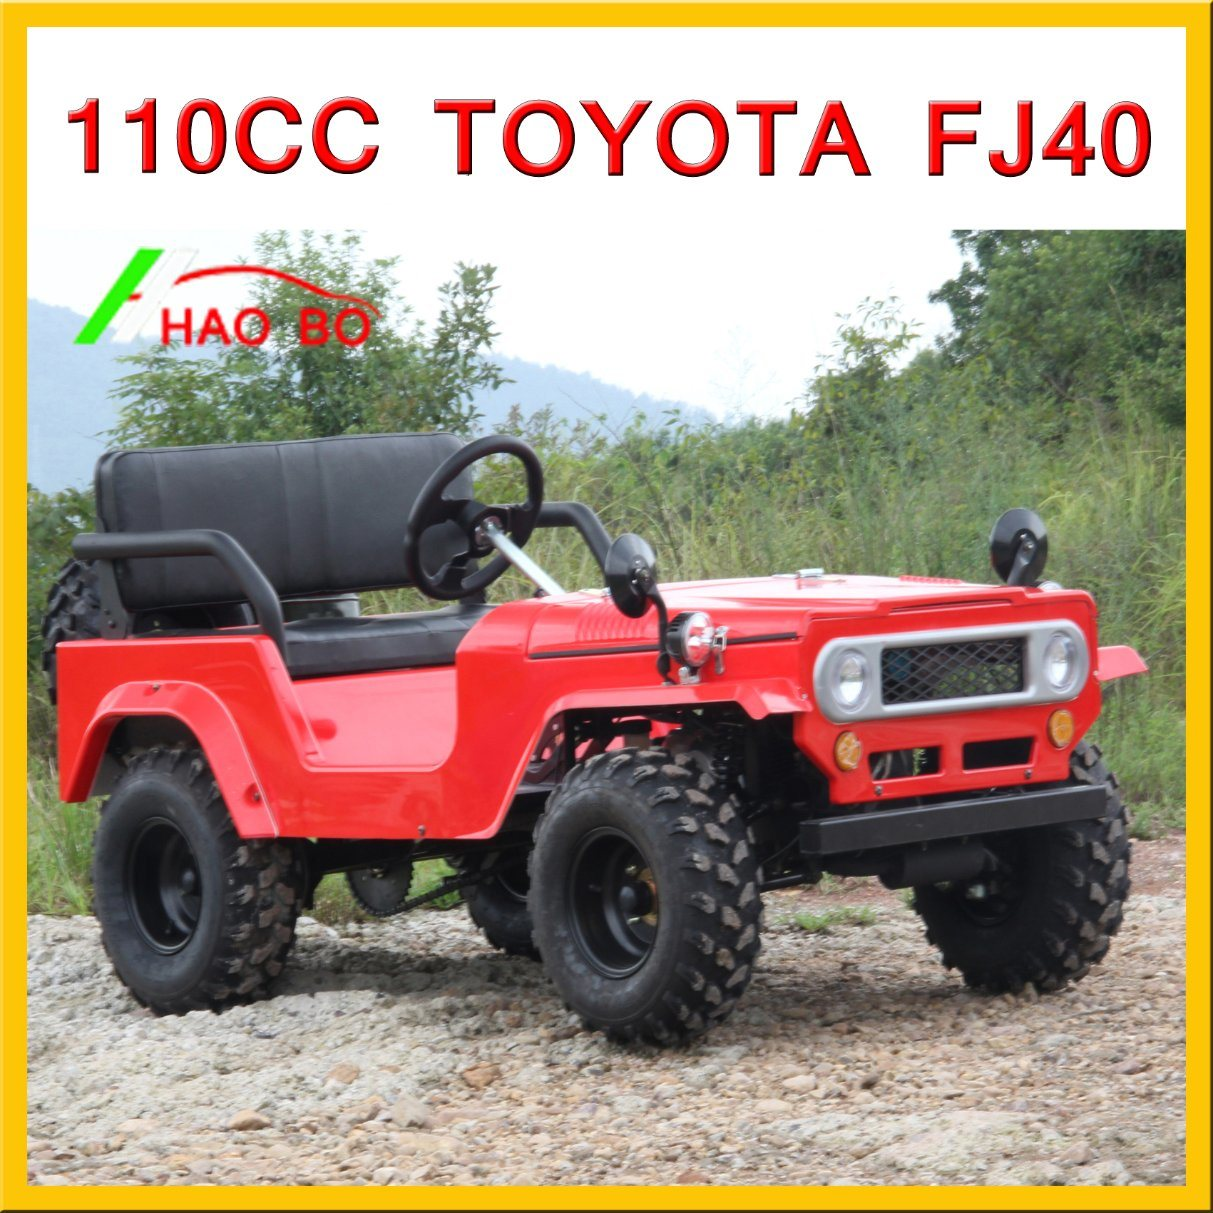 Red Color Land Cruiser 110cc 125cc 150cc 200cc ATV